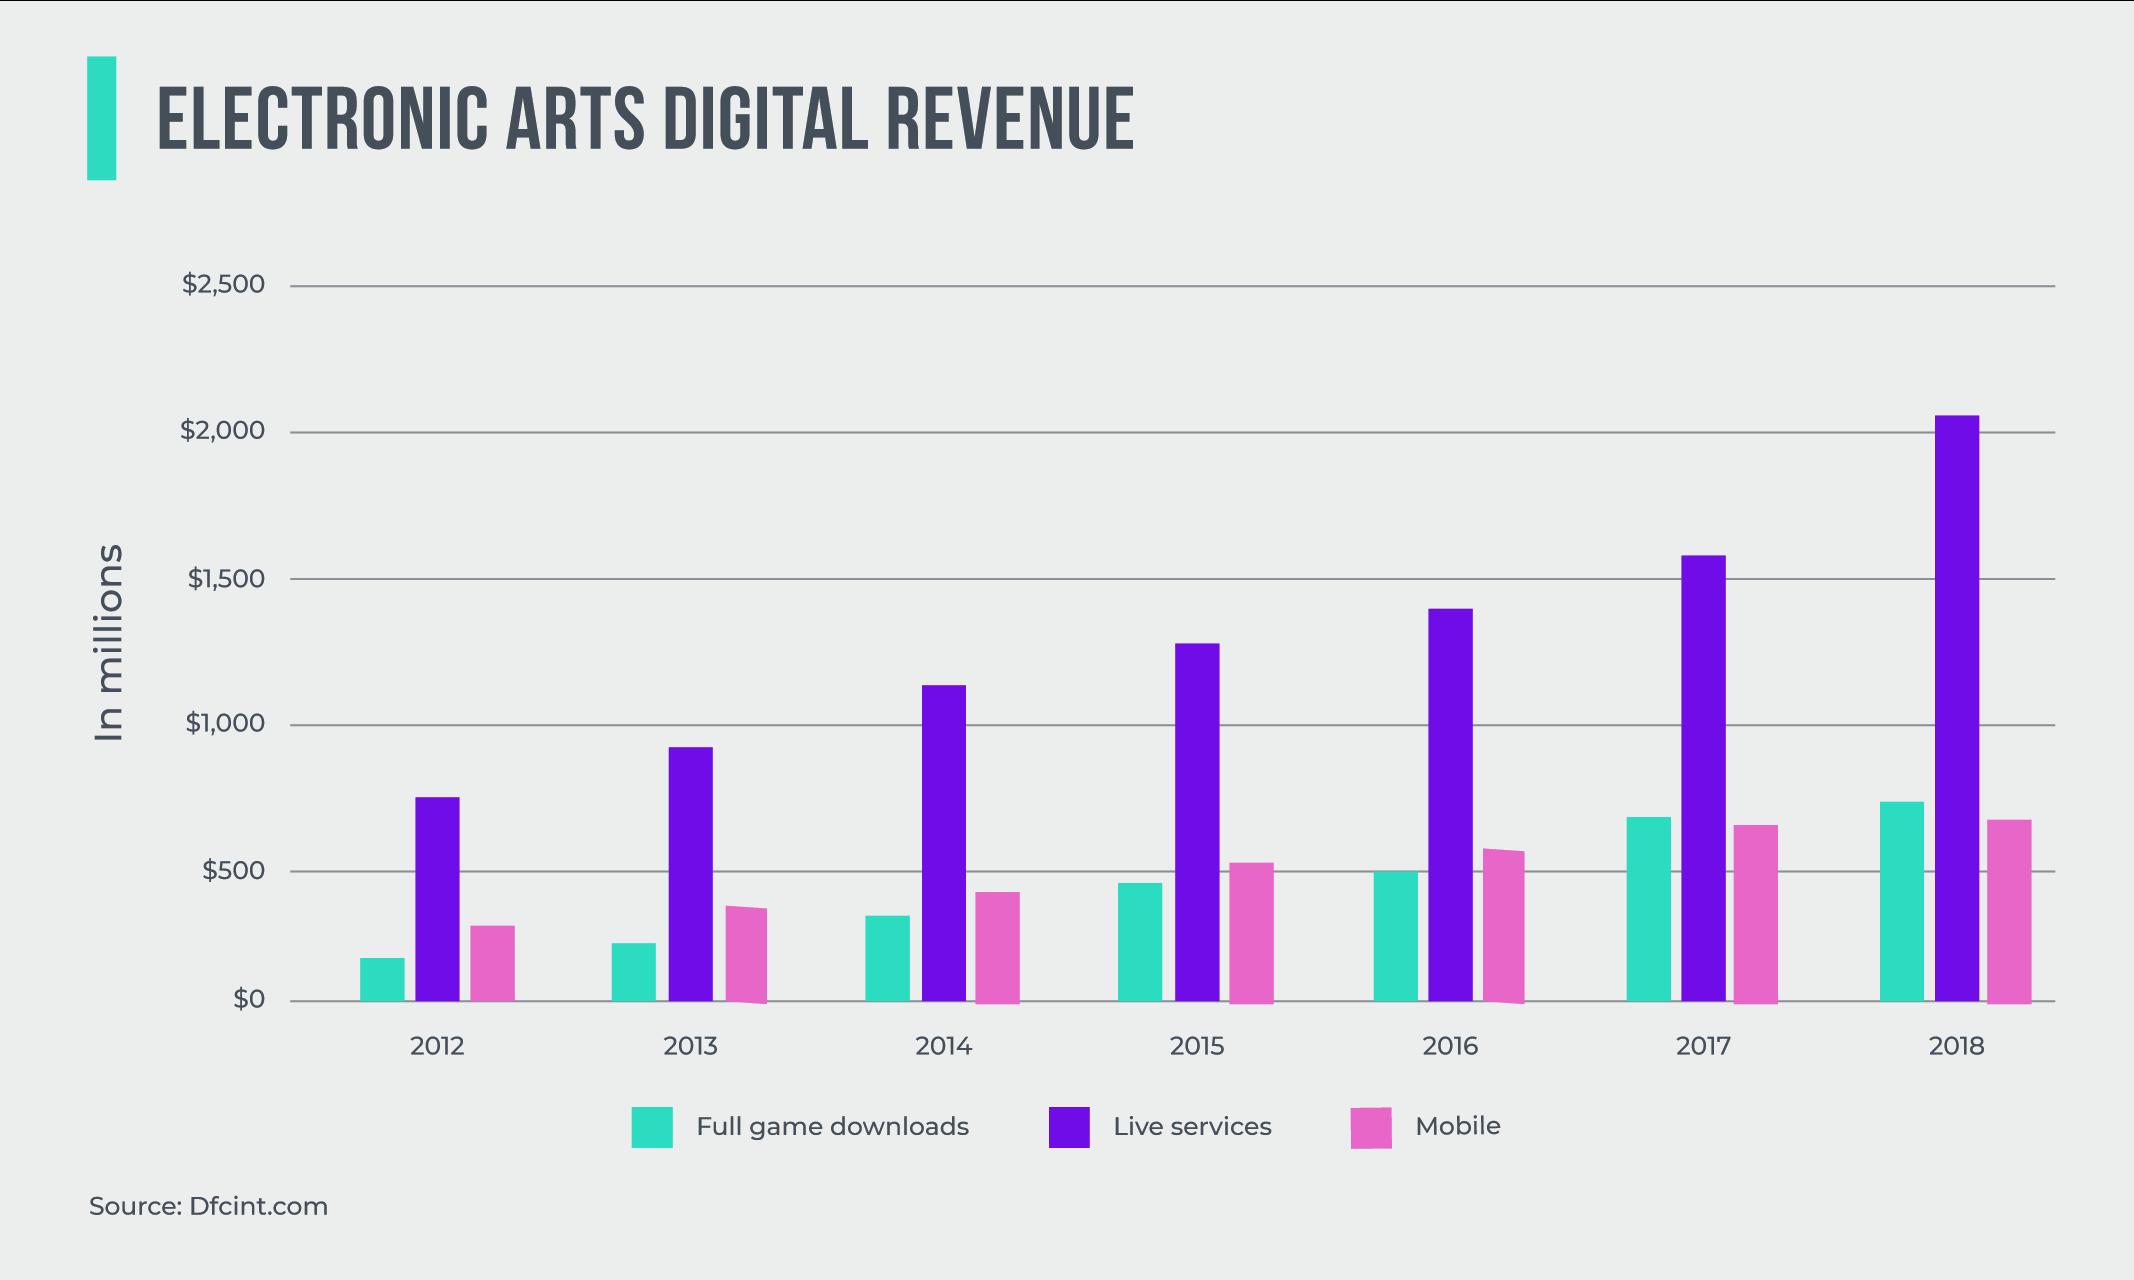 Electronic Arts Digital Revenue